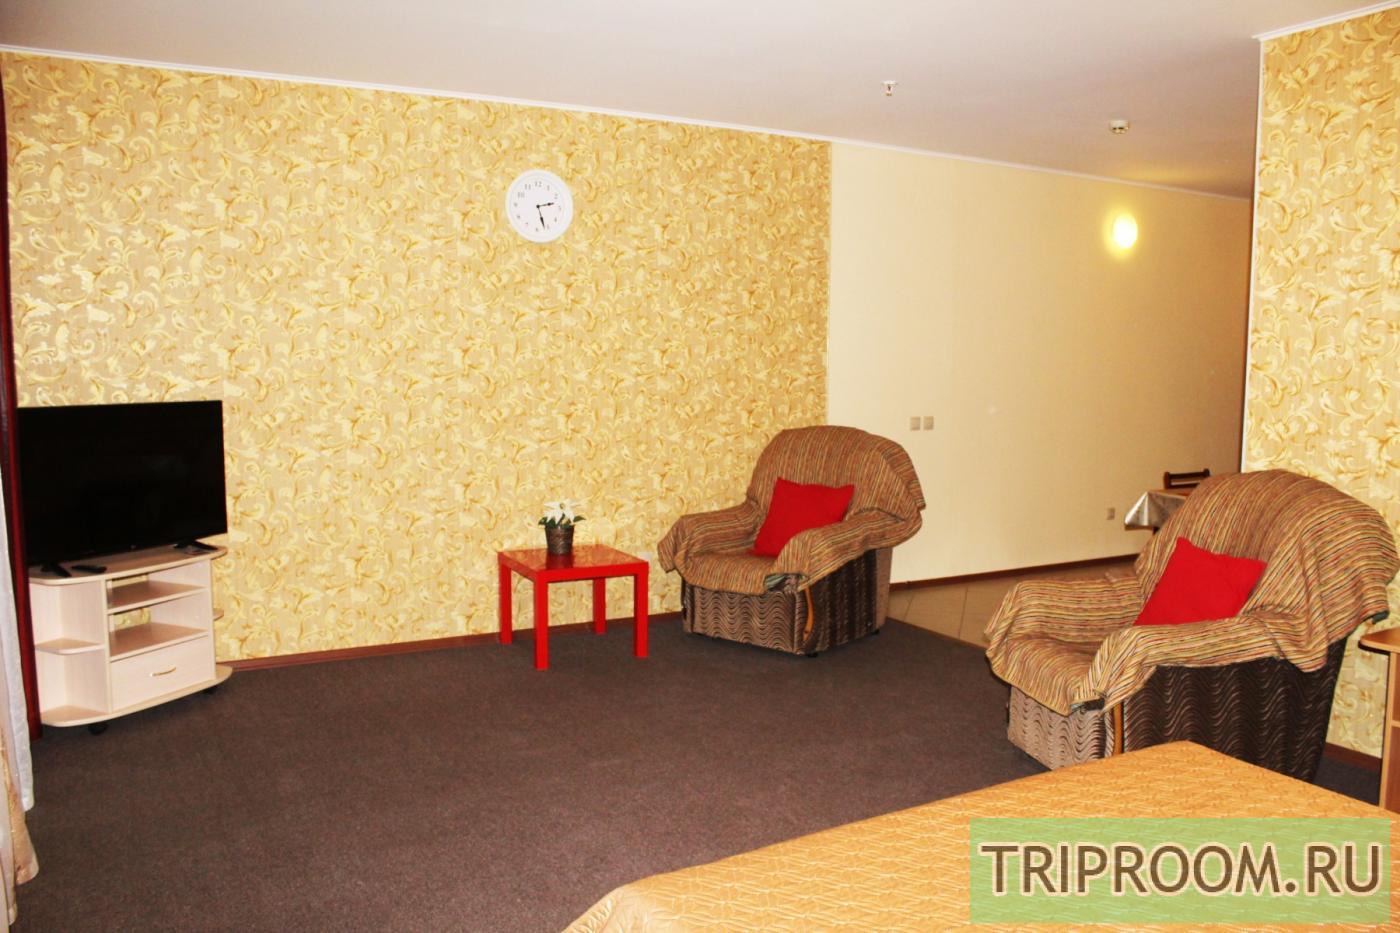 1-комнатная квартира посуточно (вариант № 35144), ул. Гагарина бульвар, фото № 3